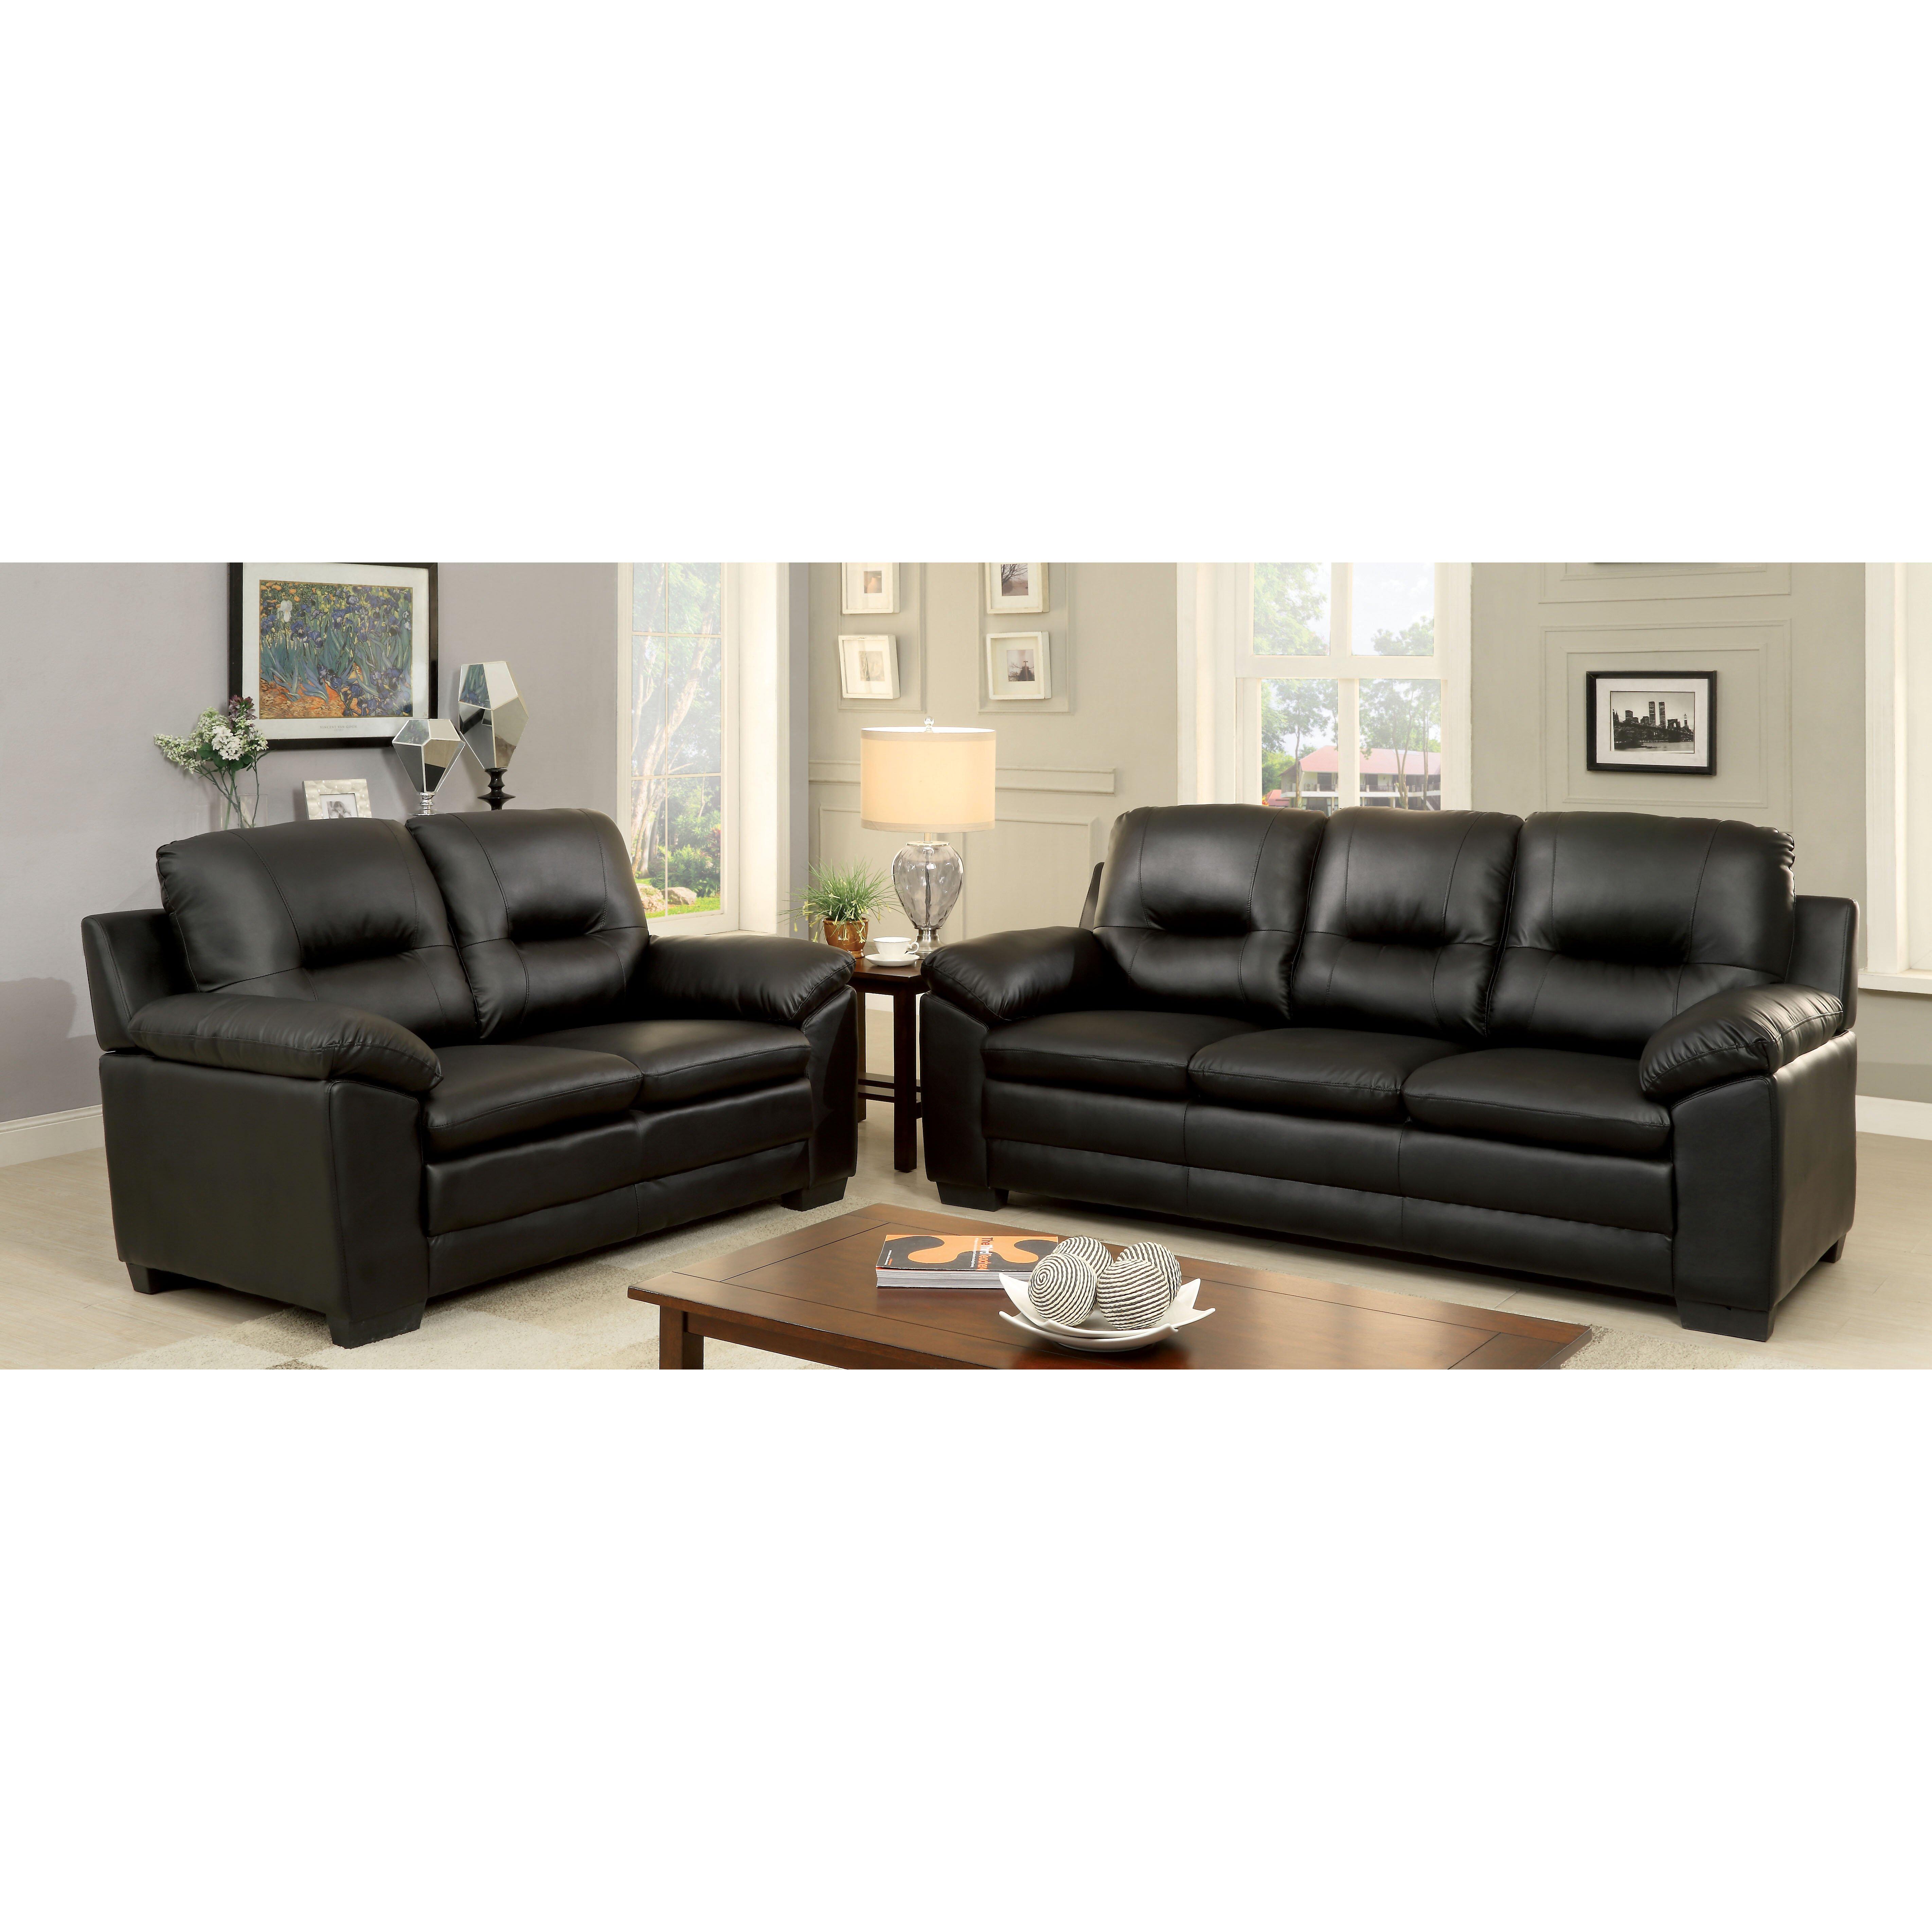 Flexsteel Westside Sofa Reviews: Hokku Designs Dolorres Sofa & Reviews